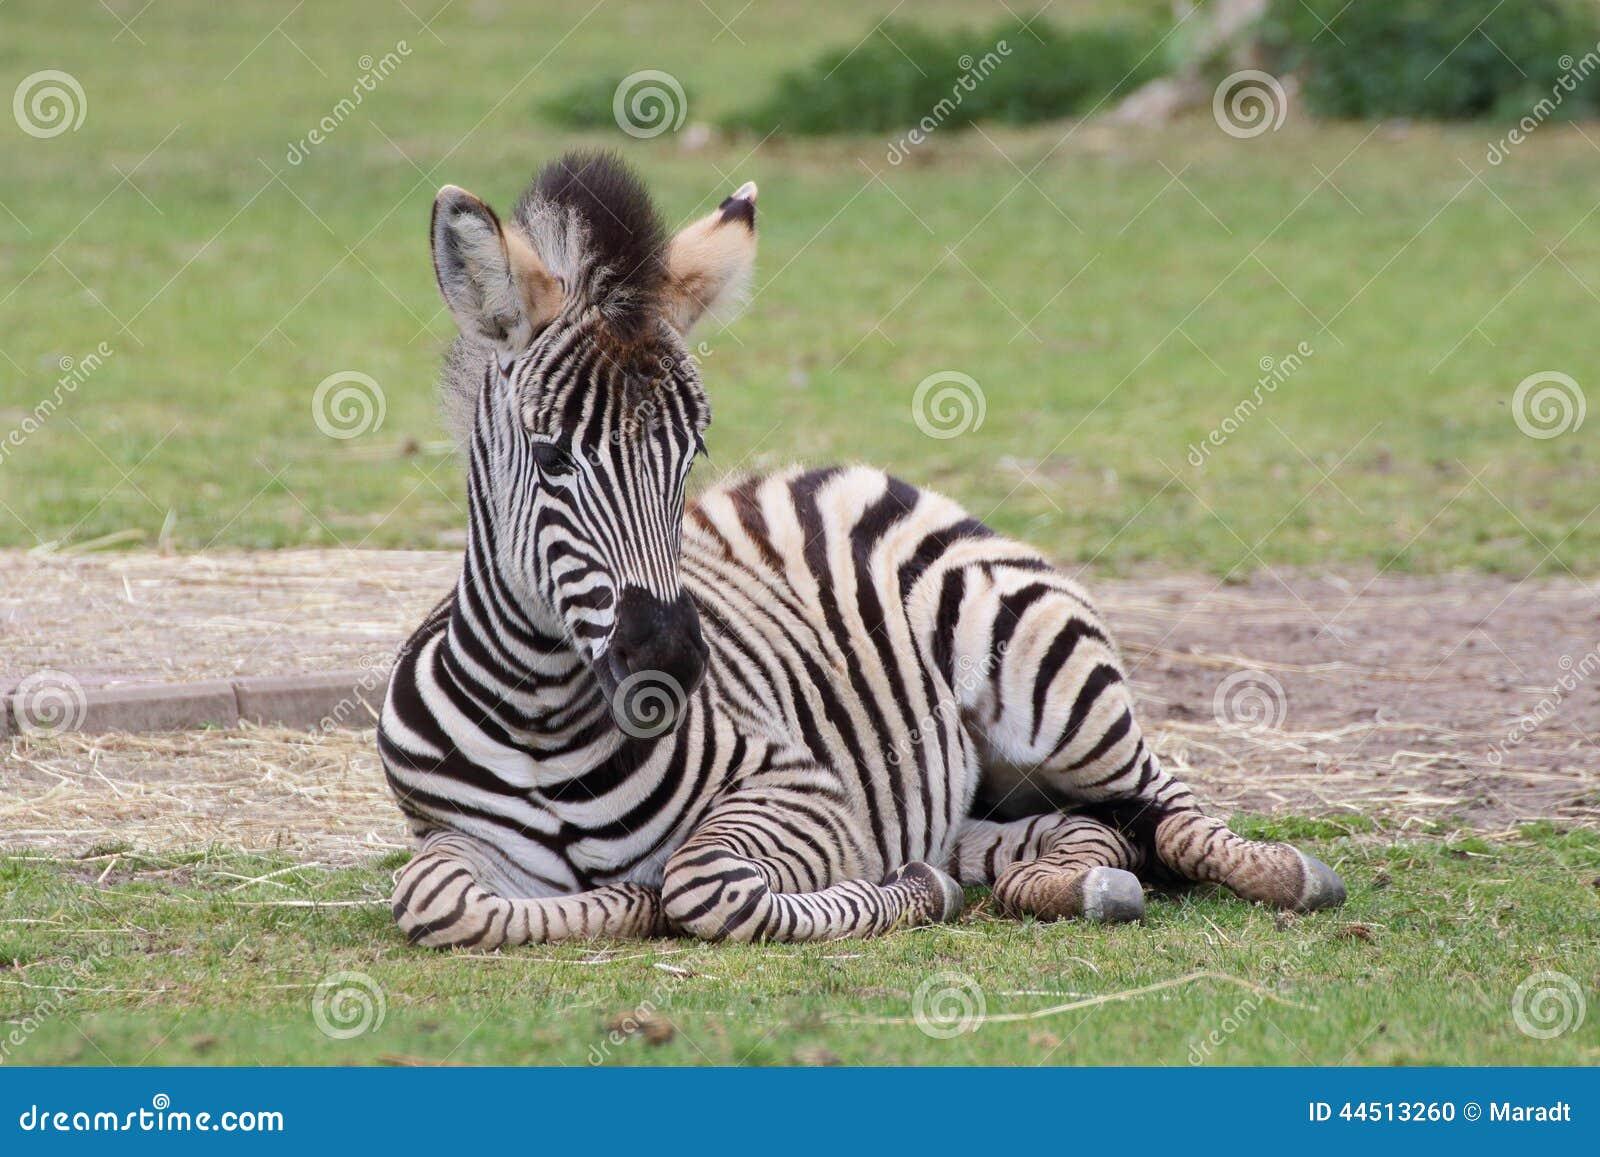 Lying zebra baby closeup view stock photo image